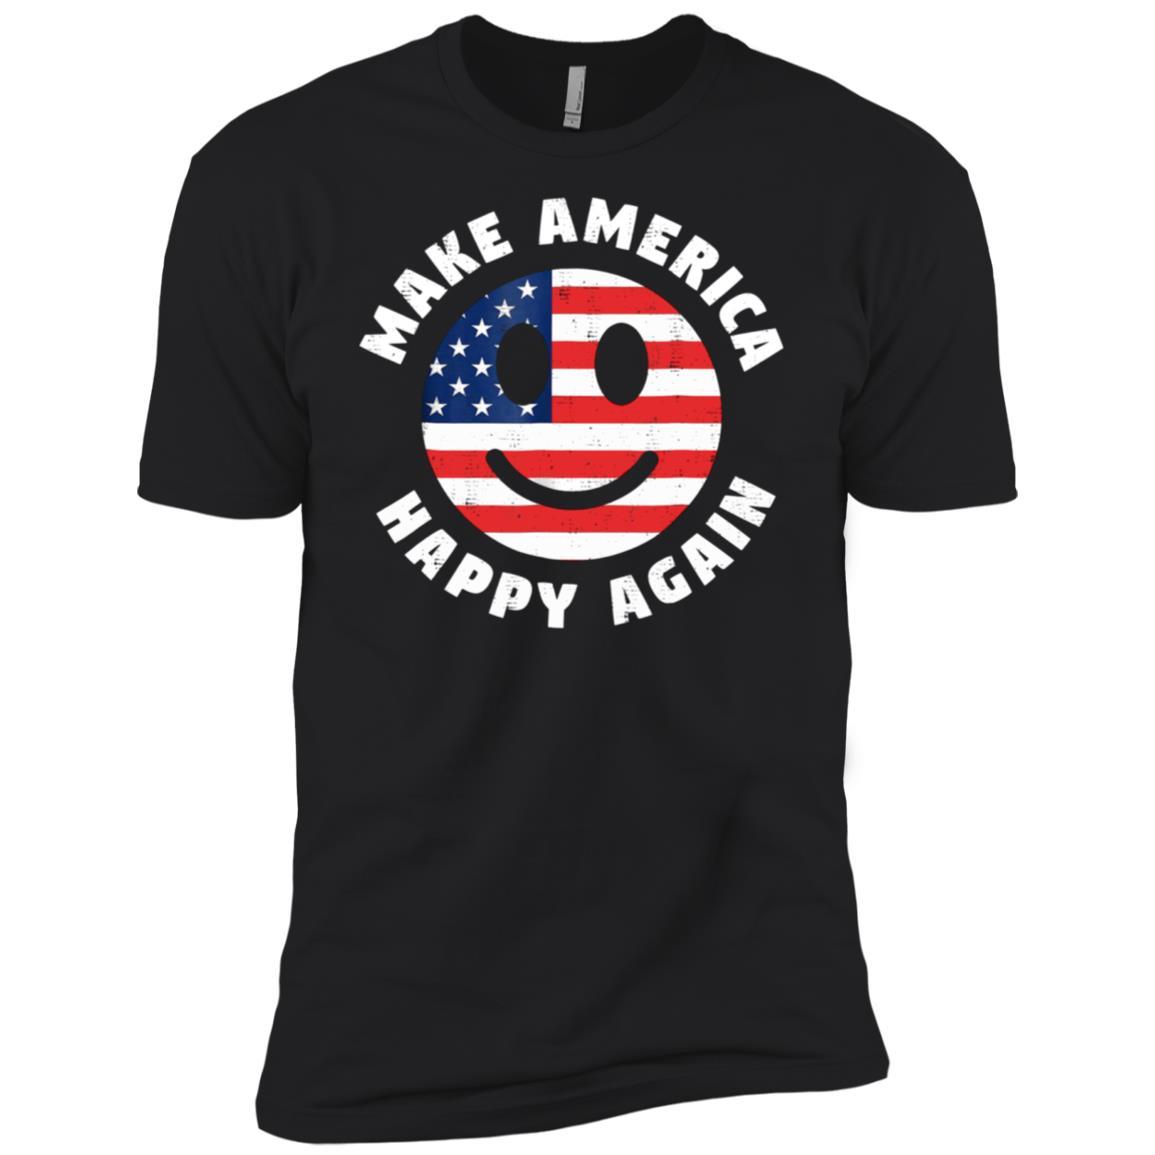 Make America Happy Again Funny Smiley Face Tee Men Short Sleeve T-Shirt